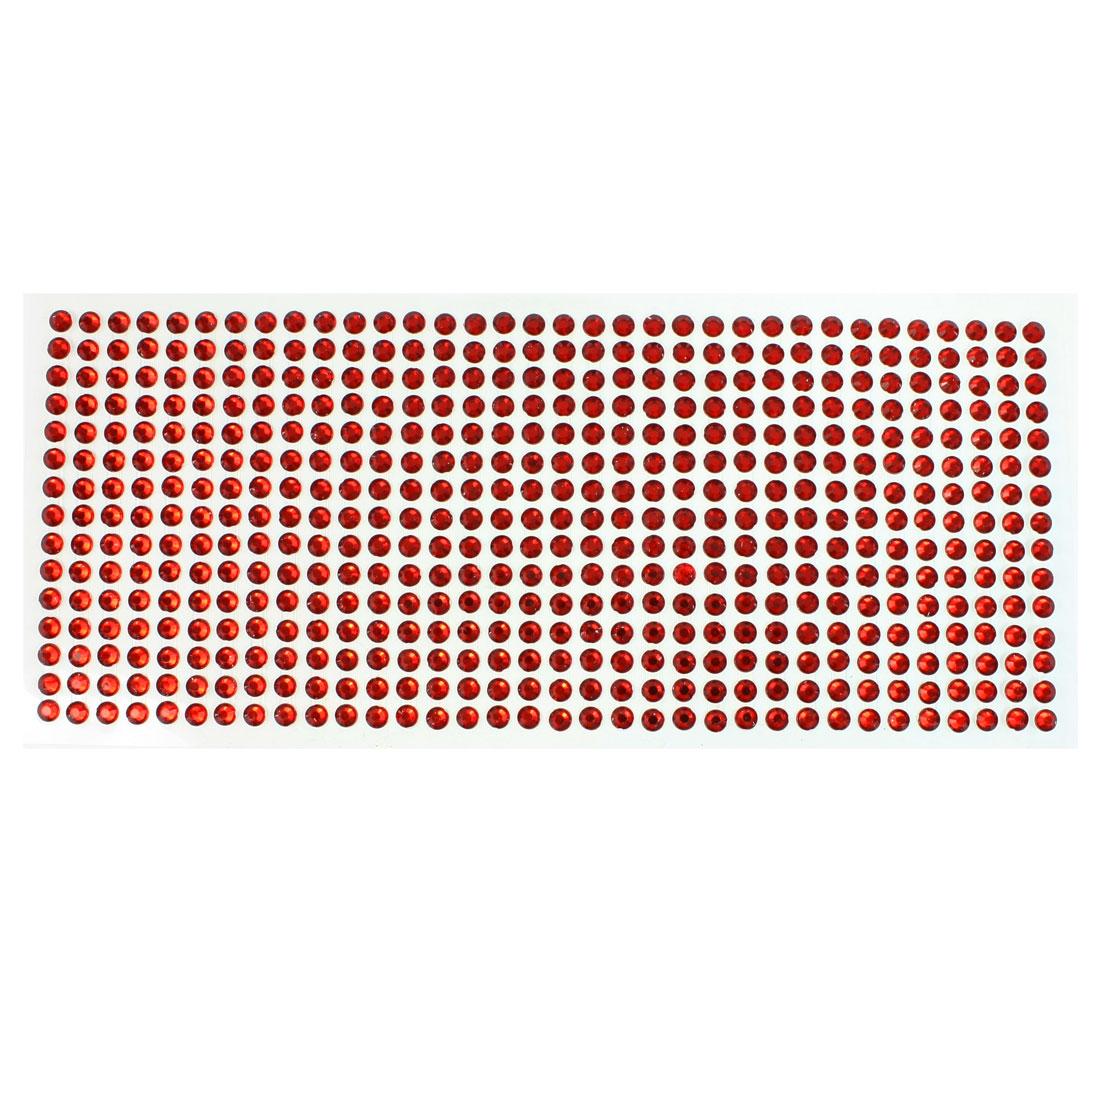 DIY Car Vehicles Red Plastic Glitter Rhinestone Self Adhesive Sticker Sheet